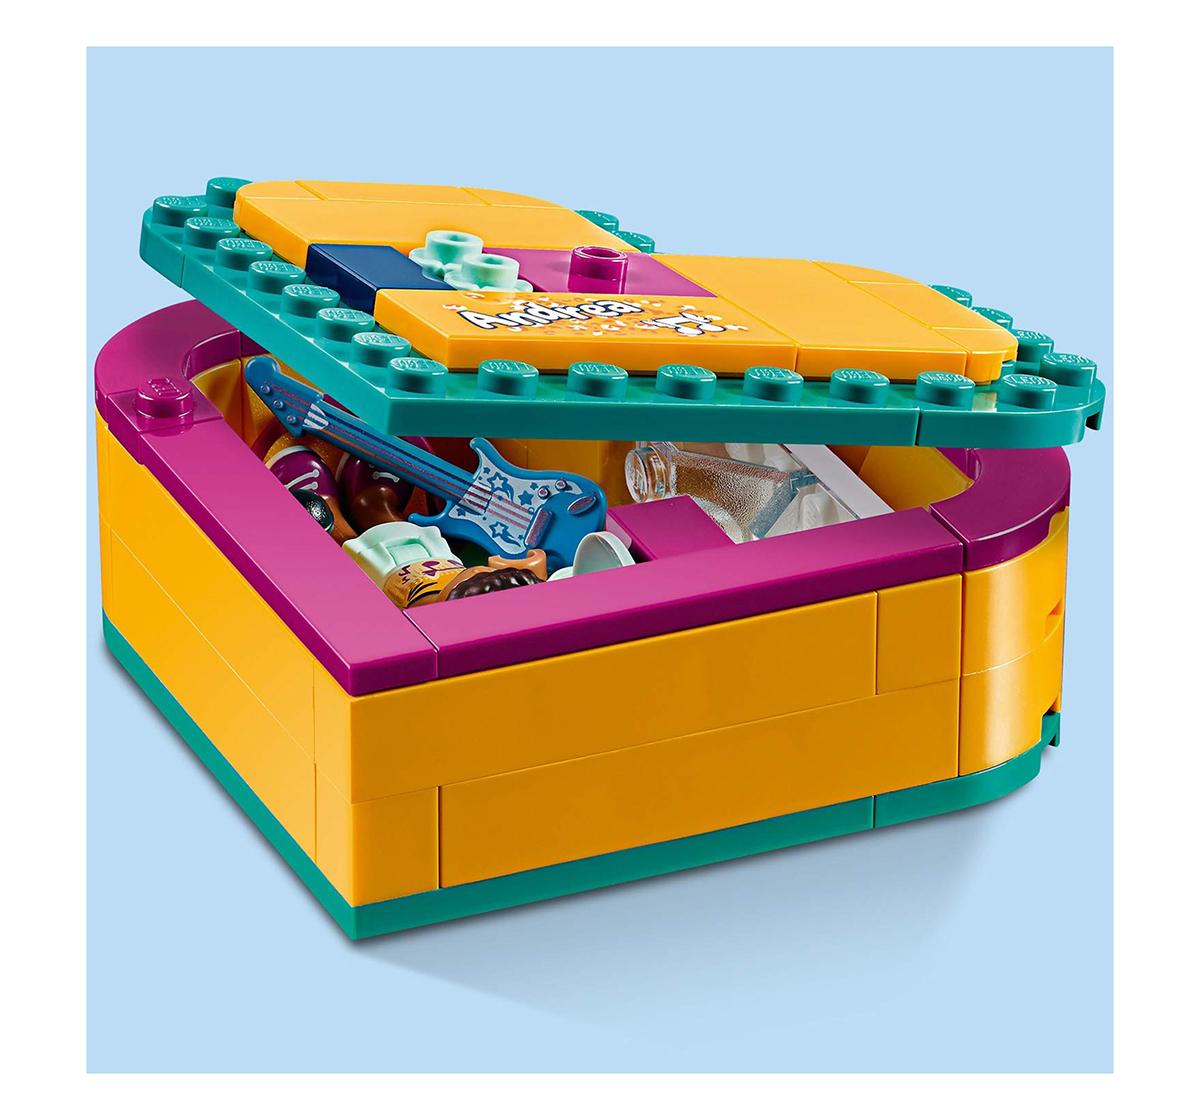 LEGO    Lego Friends Andrea's Heart Box Building Blocks  (84 Pcs) 41354  for Girls age 6Y+